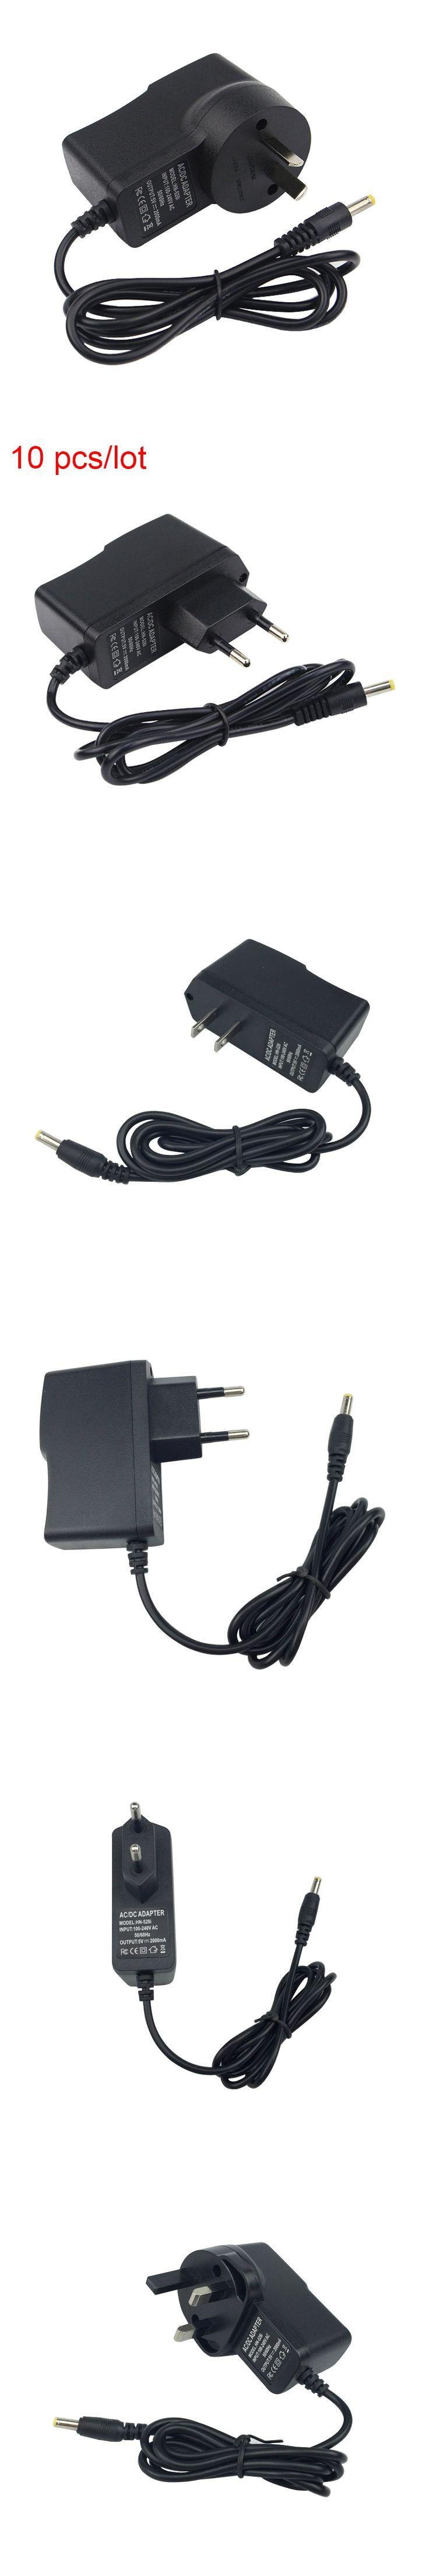 10pcs/lot 5V2A Power Charger Adapter DC 4.0 mm Port EU/US/UK/AU Plug Power Supply For Orange Pi One Plus 2 PC Banana Pi M1 M2